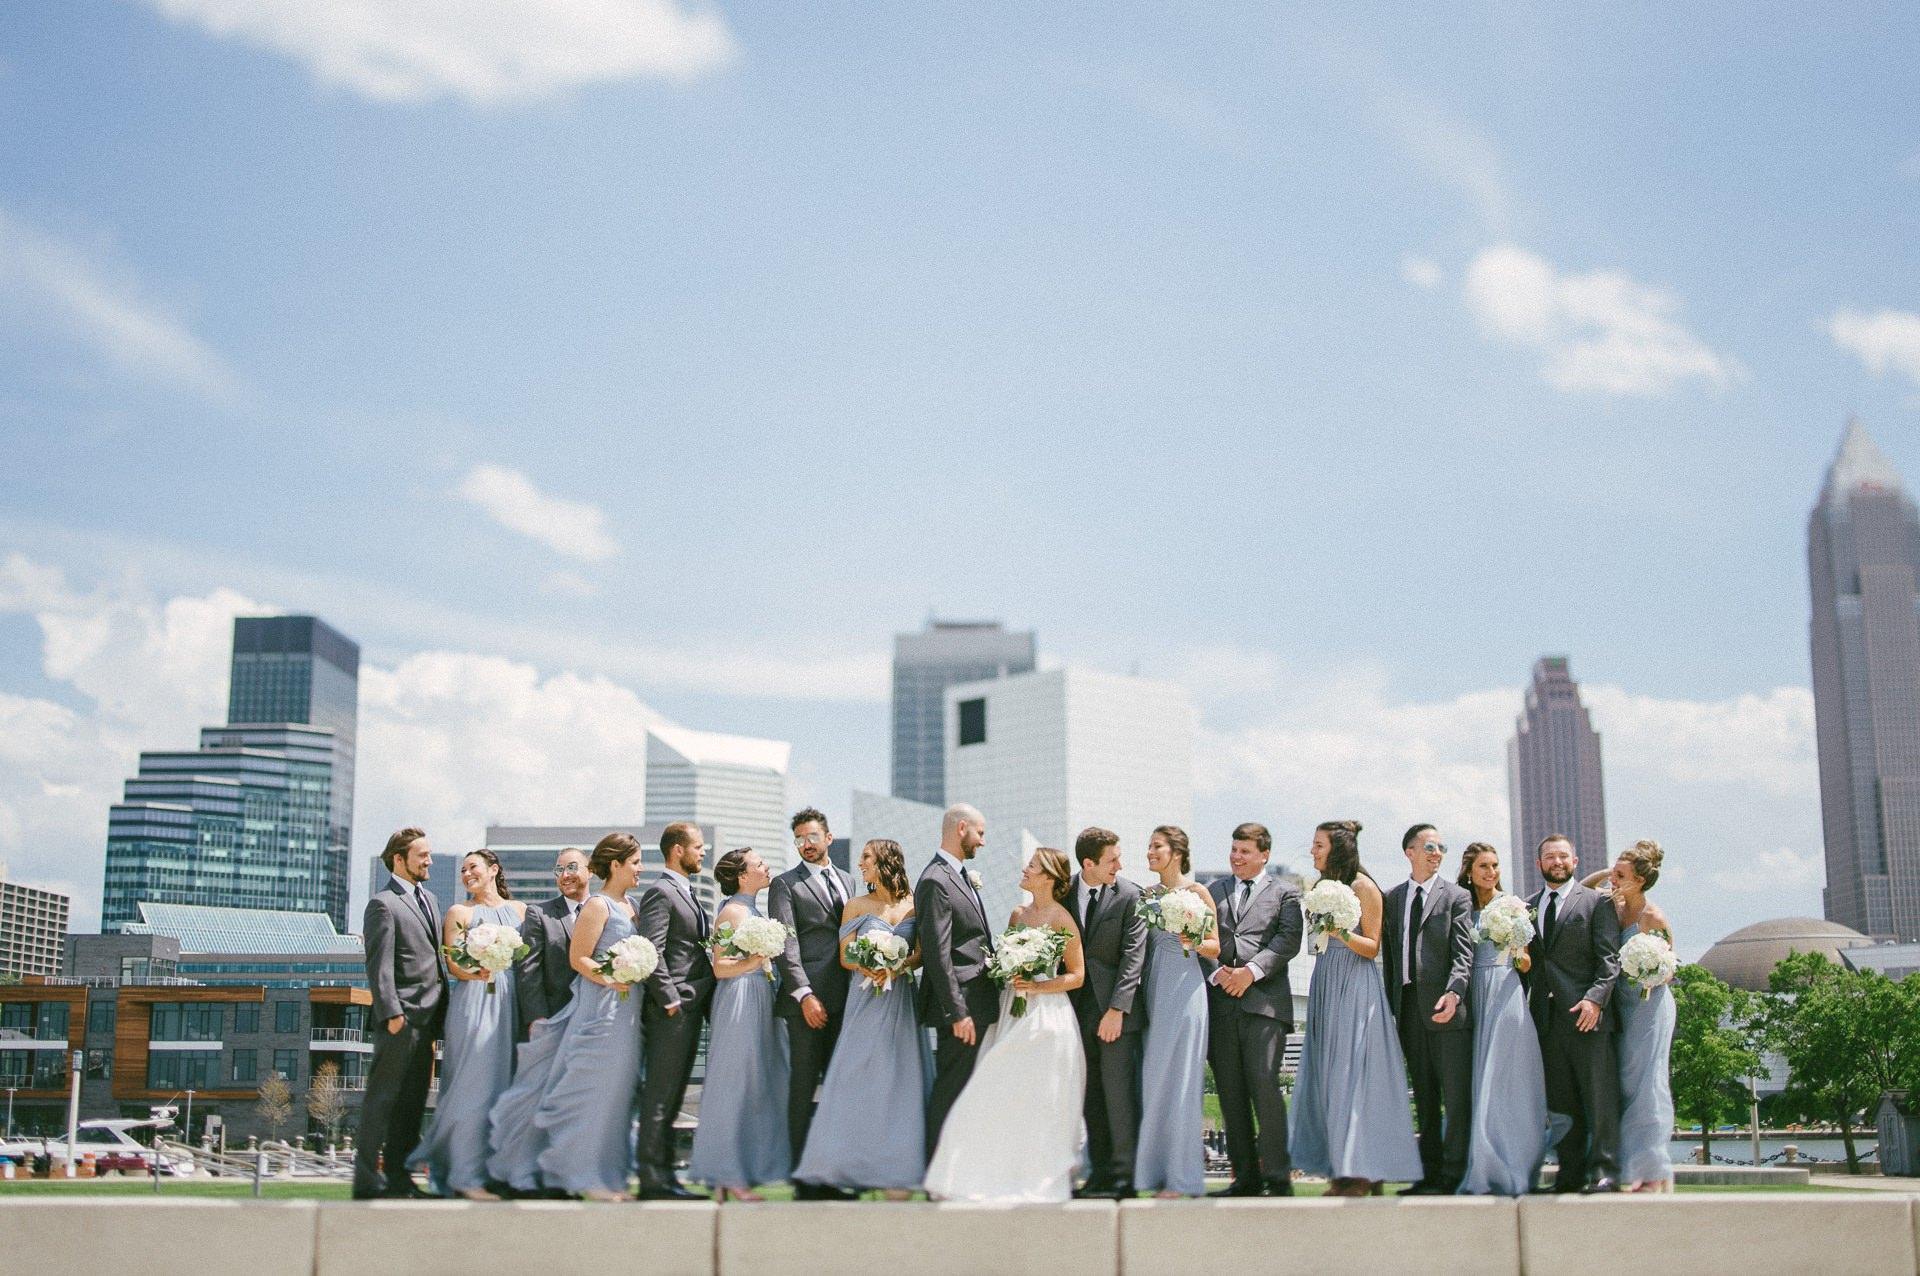 Dowtown Hilton Cleveland Wedding Photographer 1 46.jpg